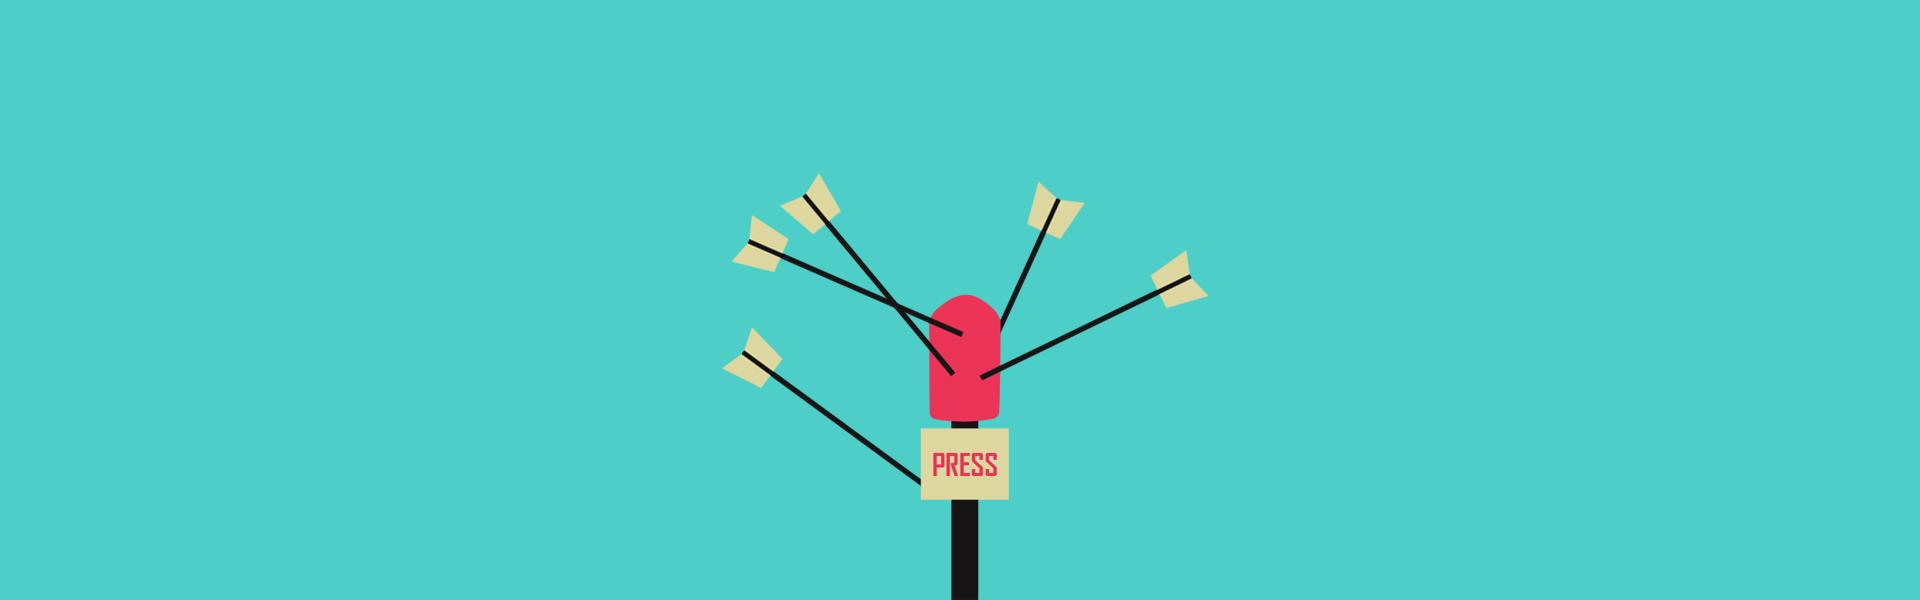 slider-press